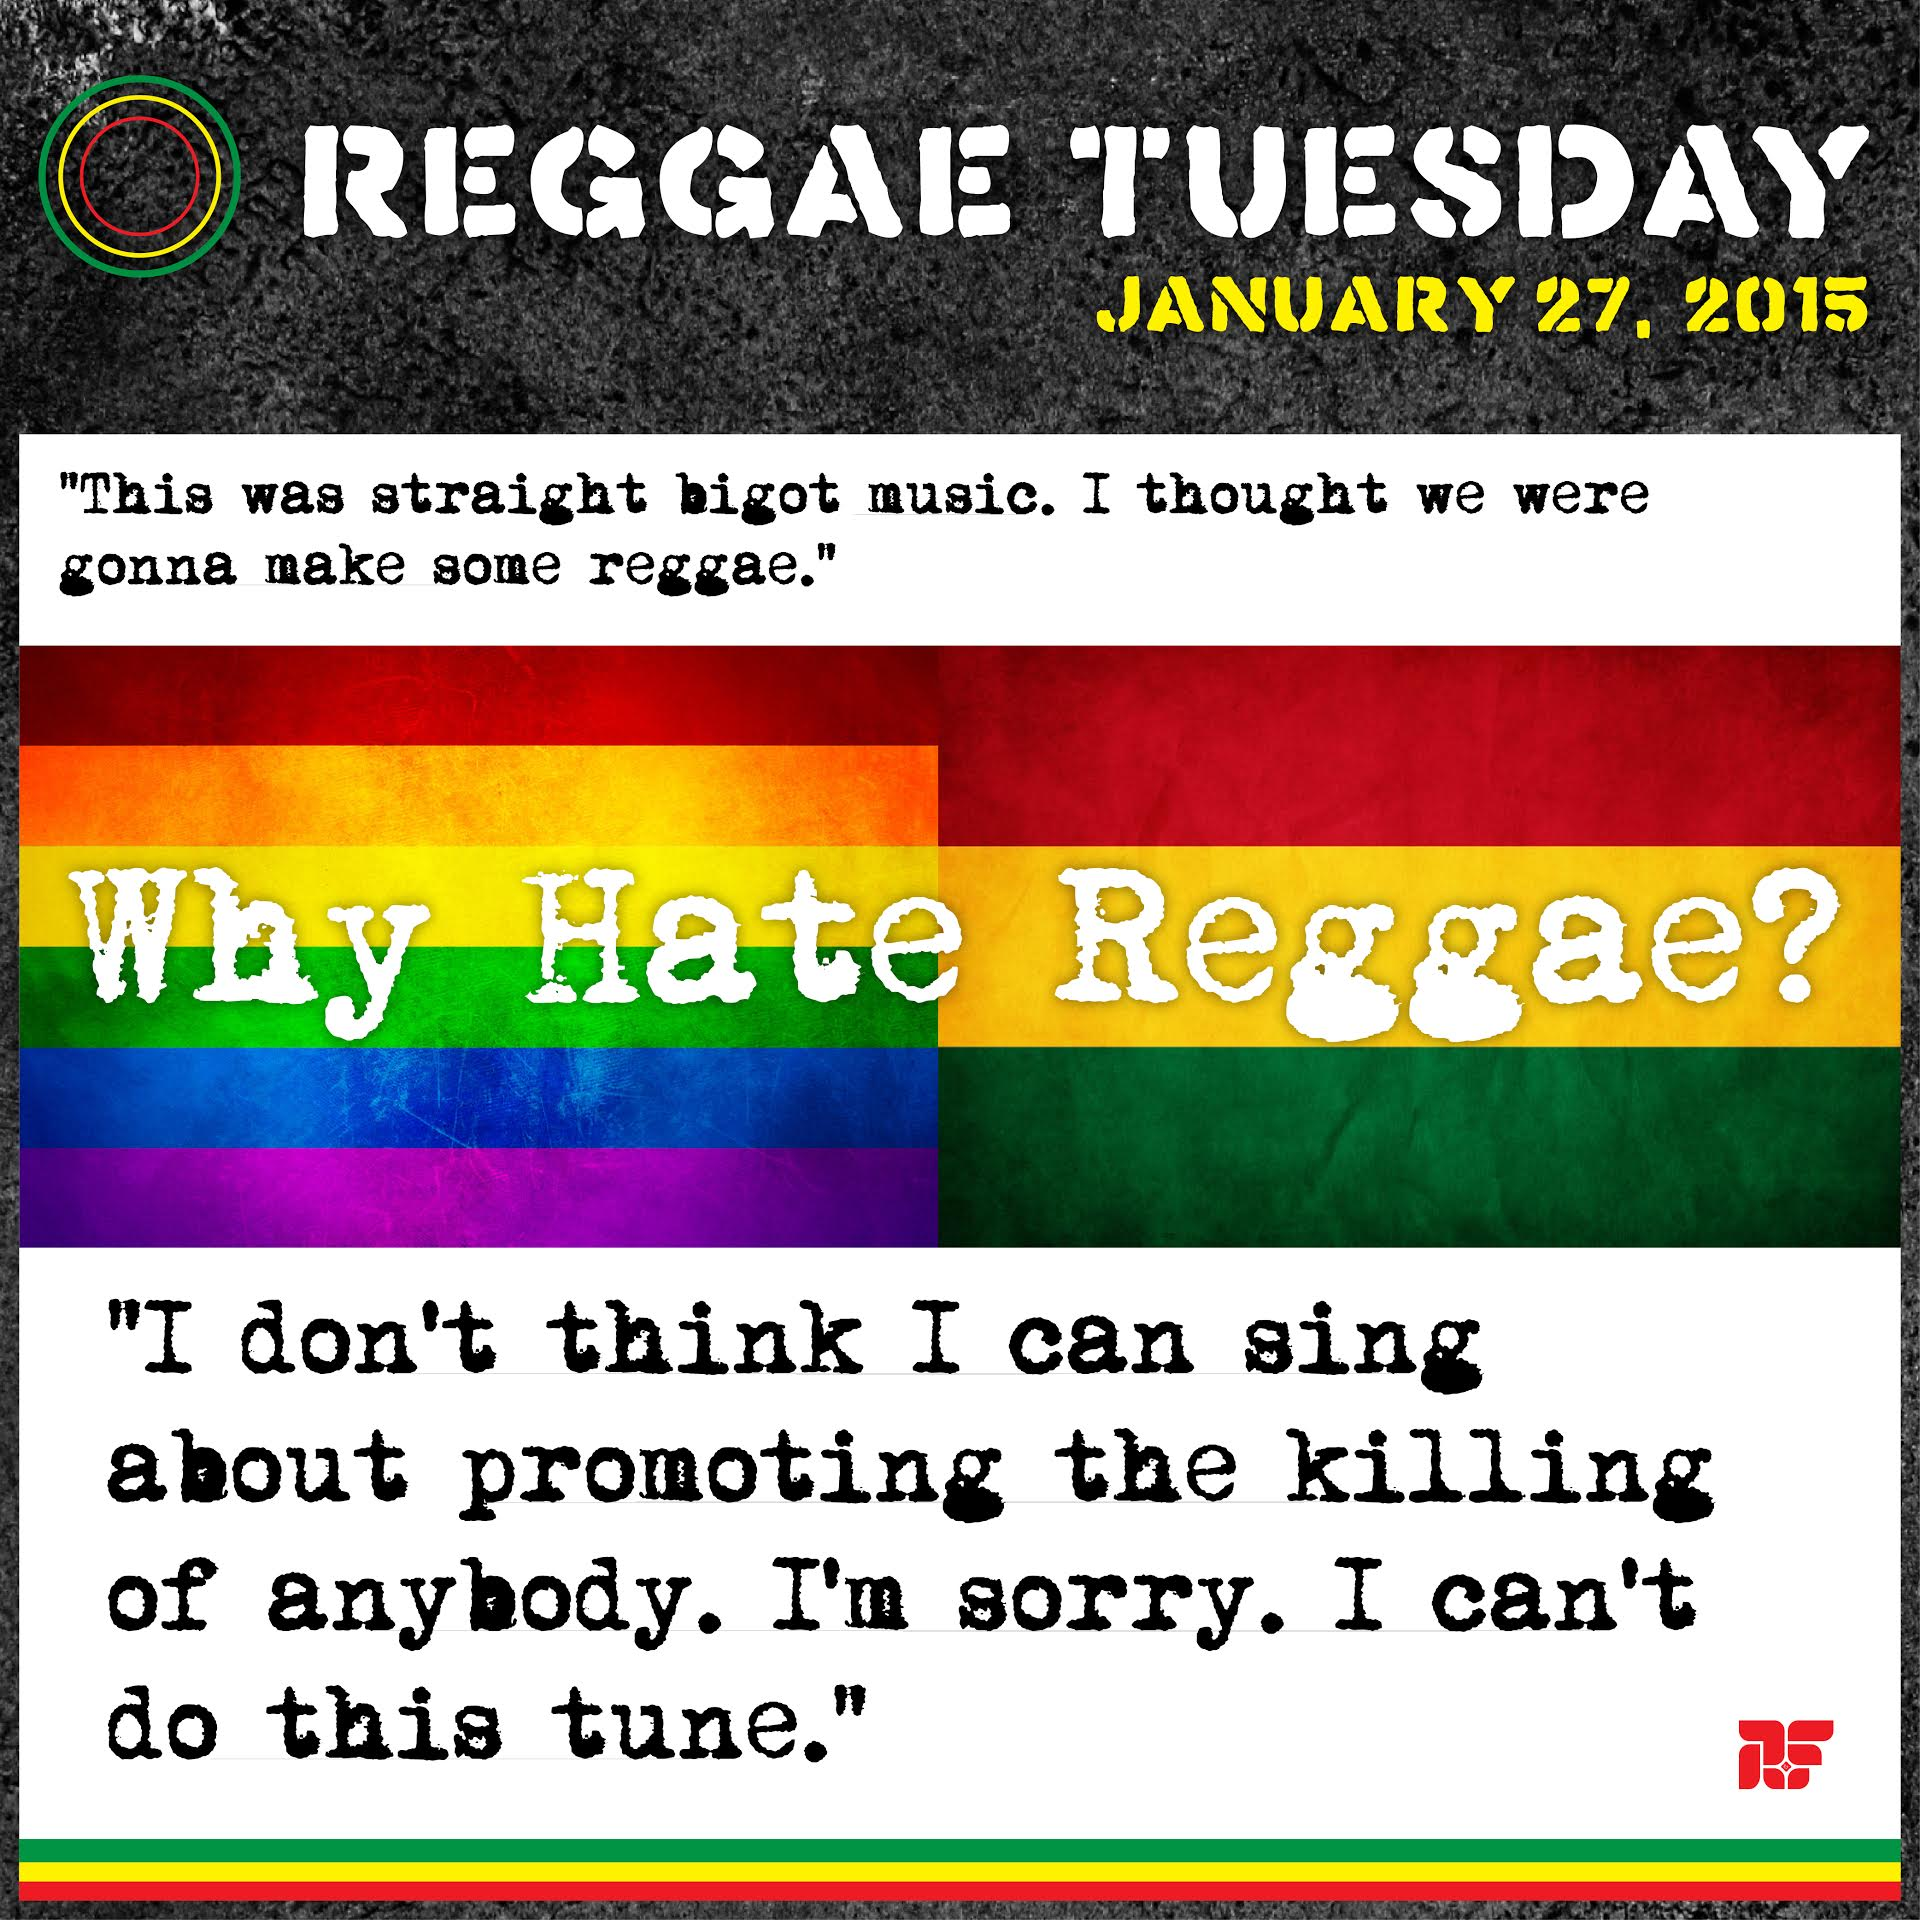 Rastafarian beliefs on homosexuality in christianity